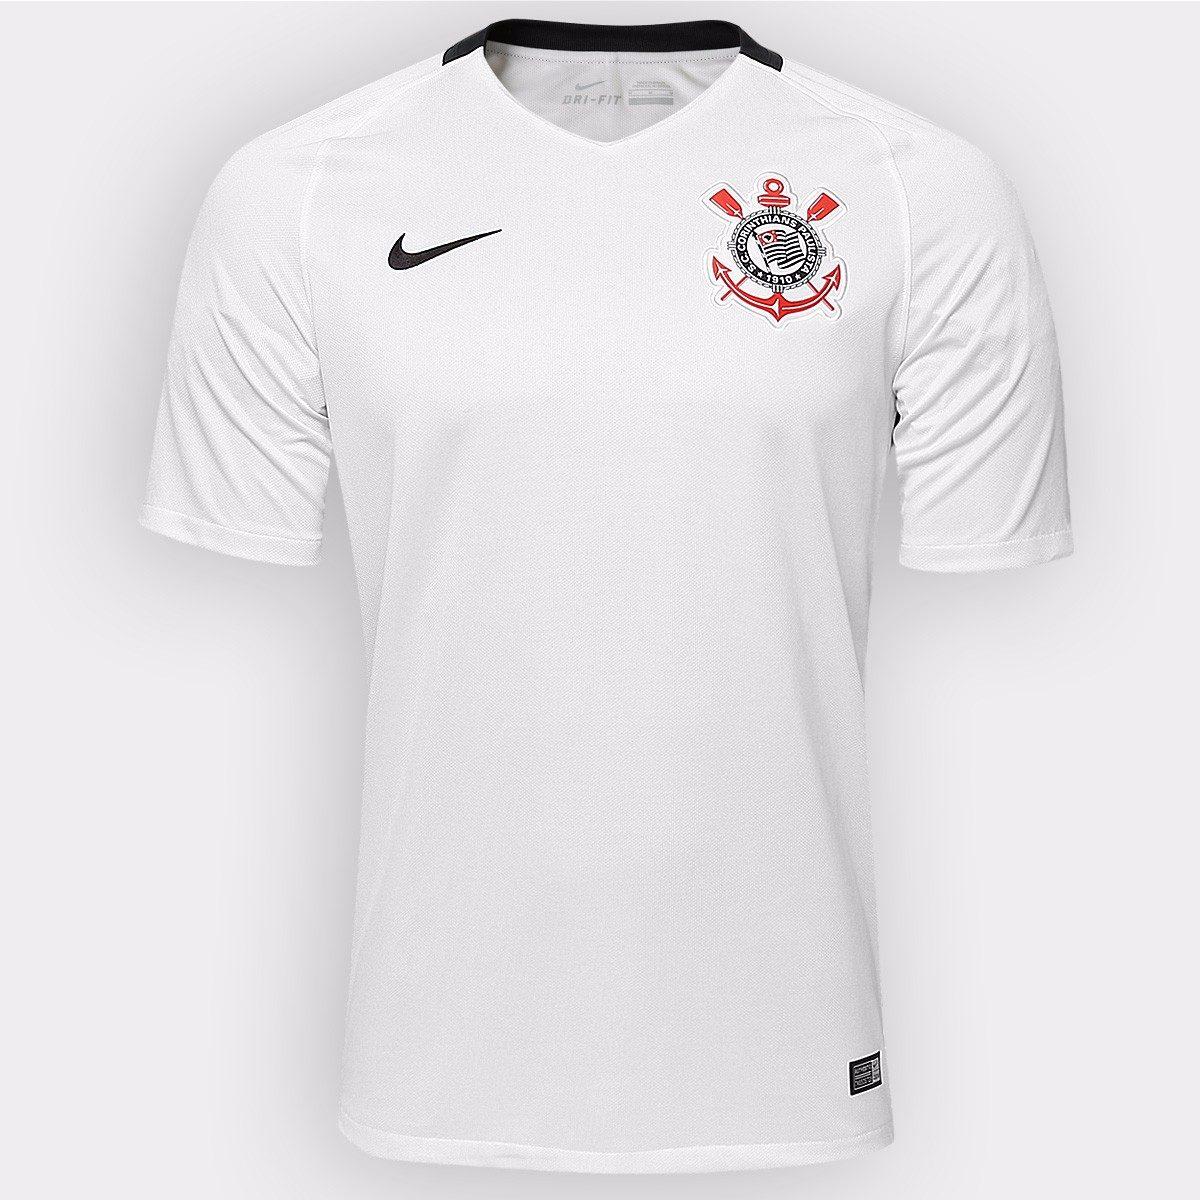 camisa nike corinthians i 16 17 s nº masculina 100% original. Carregando  zoom. b459196937c72